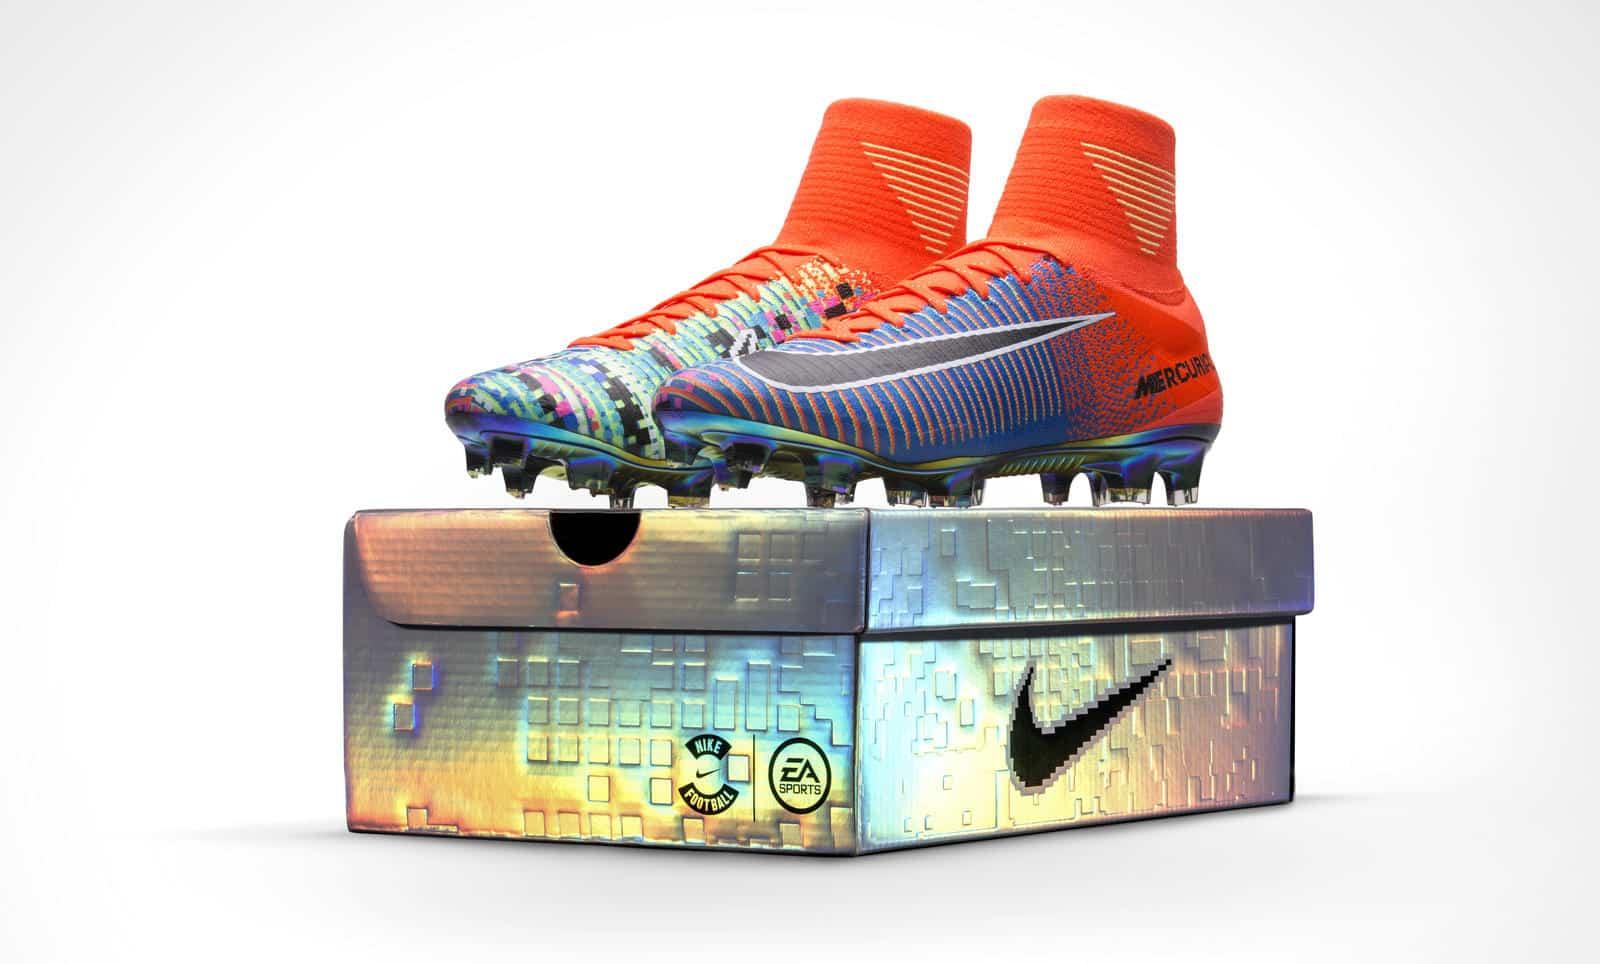 nike football x ea sports mercurial superfly, Nike